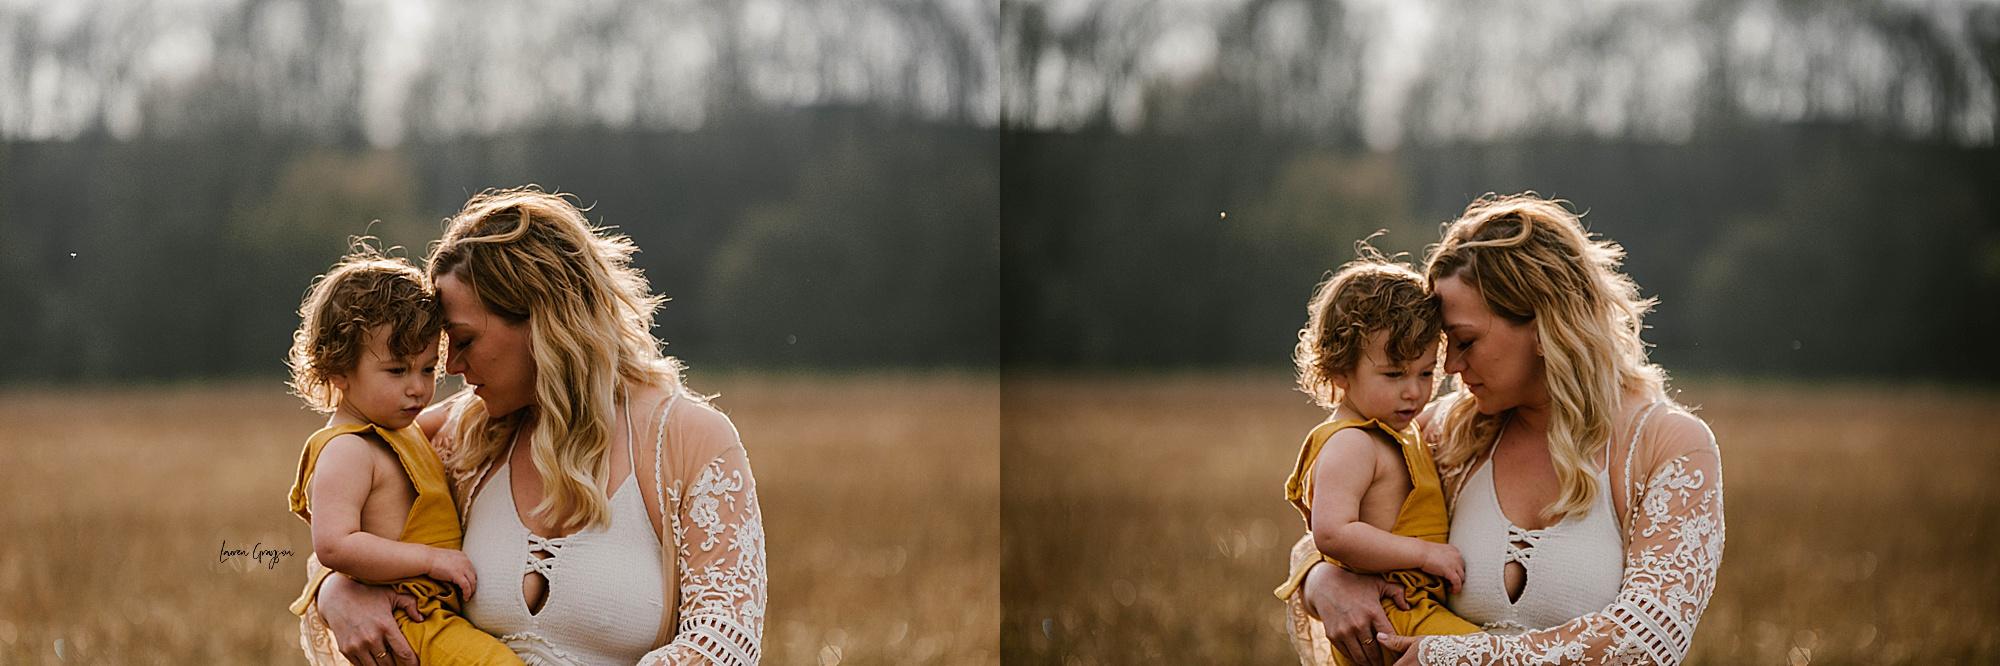 lauren-grayson-photography-akron-ohio-family-mom-boys-field-spring-outdoor-session_0009.jpg